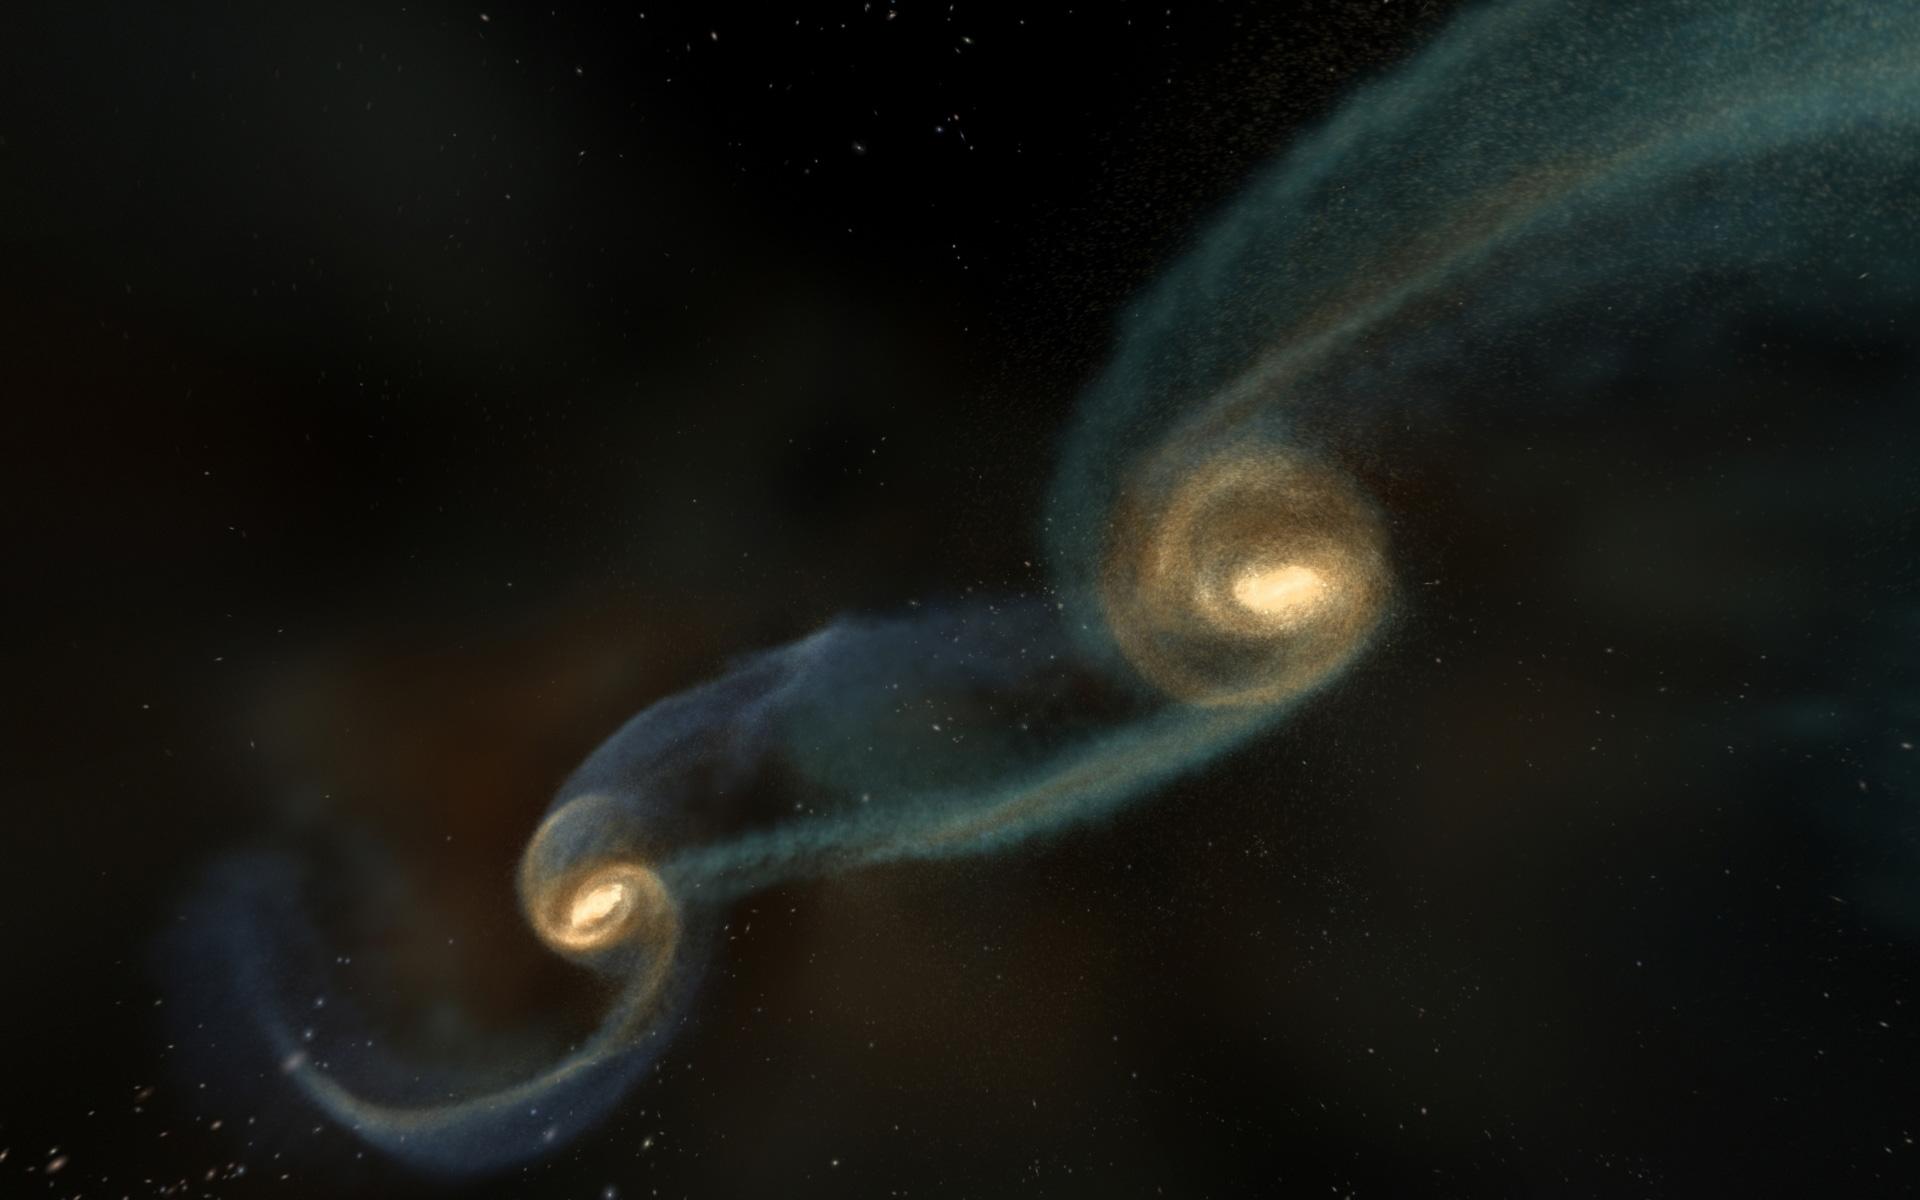 Black Hole HD Wallpaper | Background Image | 1920x1200 ...